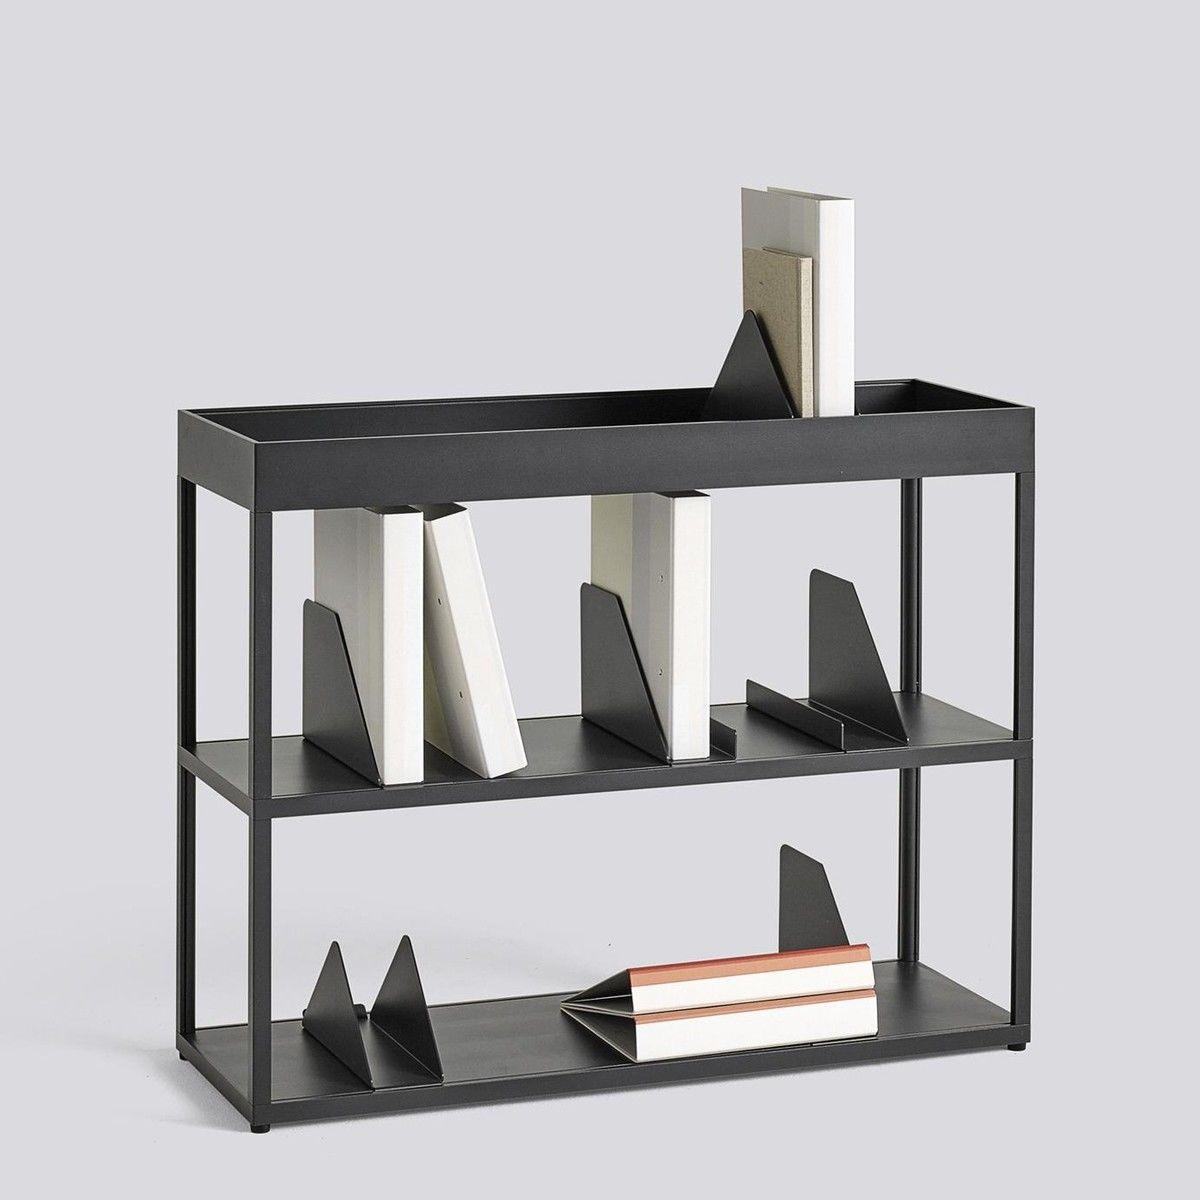 new order tray rek 100x90cm hay. Black Bedroom Furniture Sets. Home Design Ideas